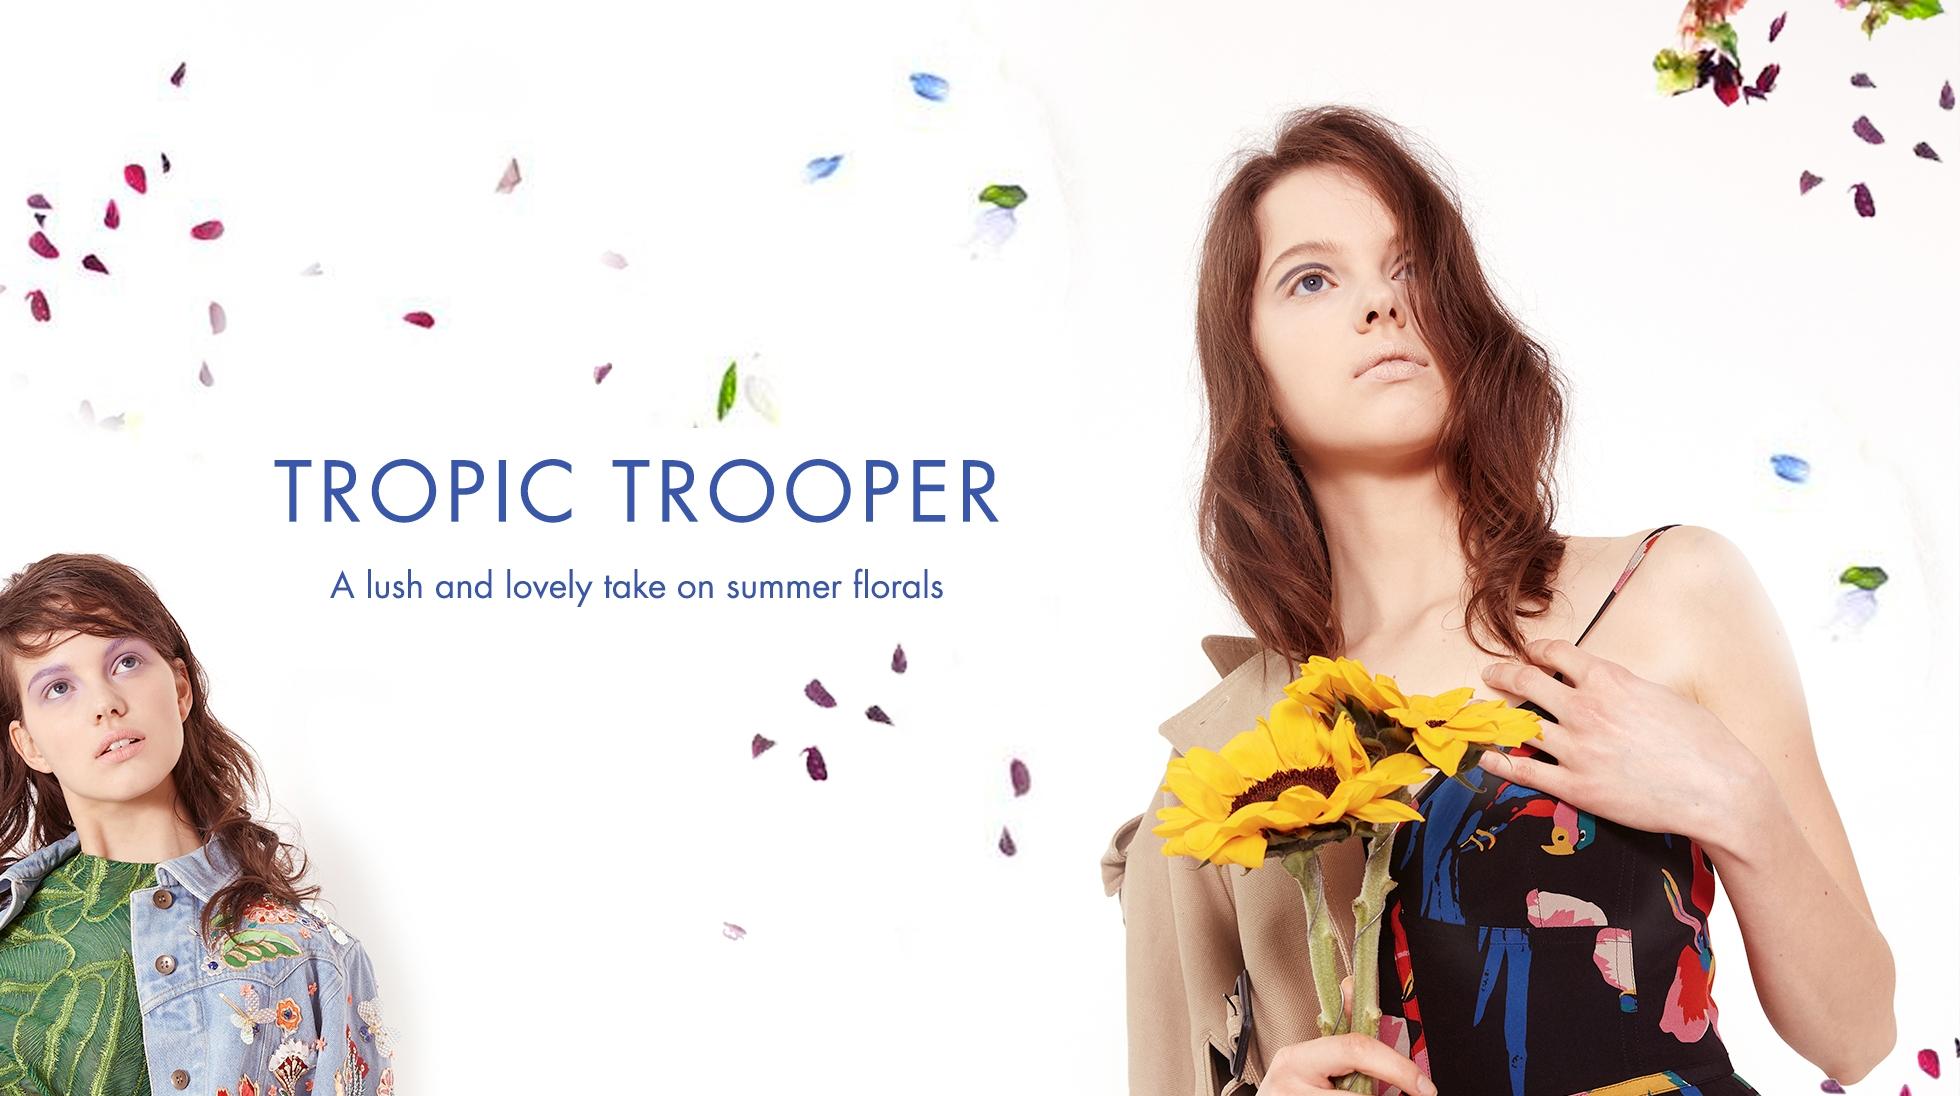 Tropic Trooper